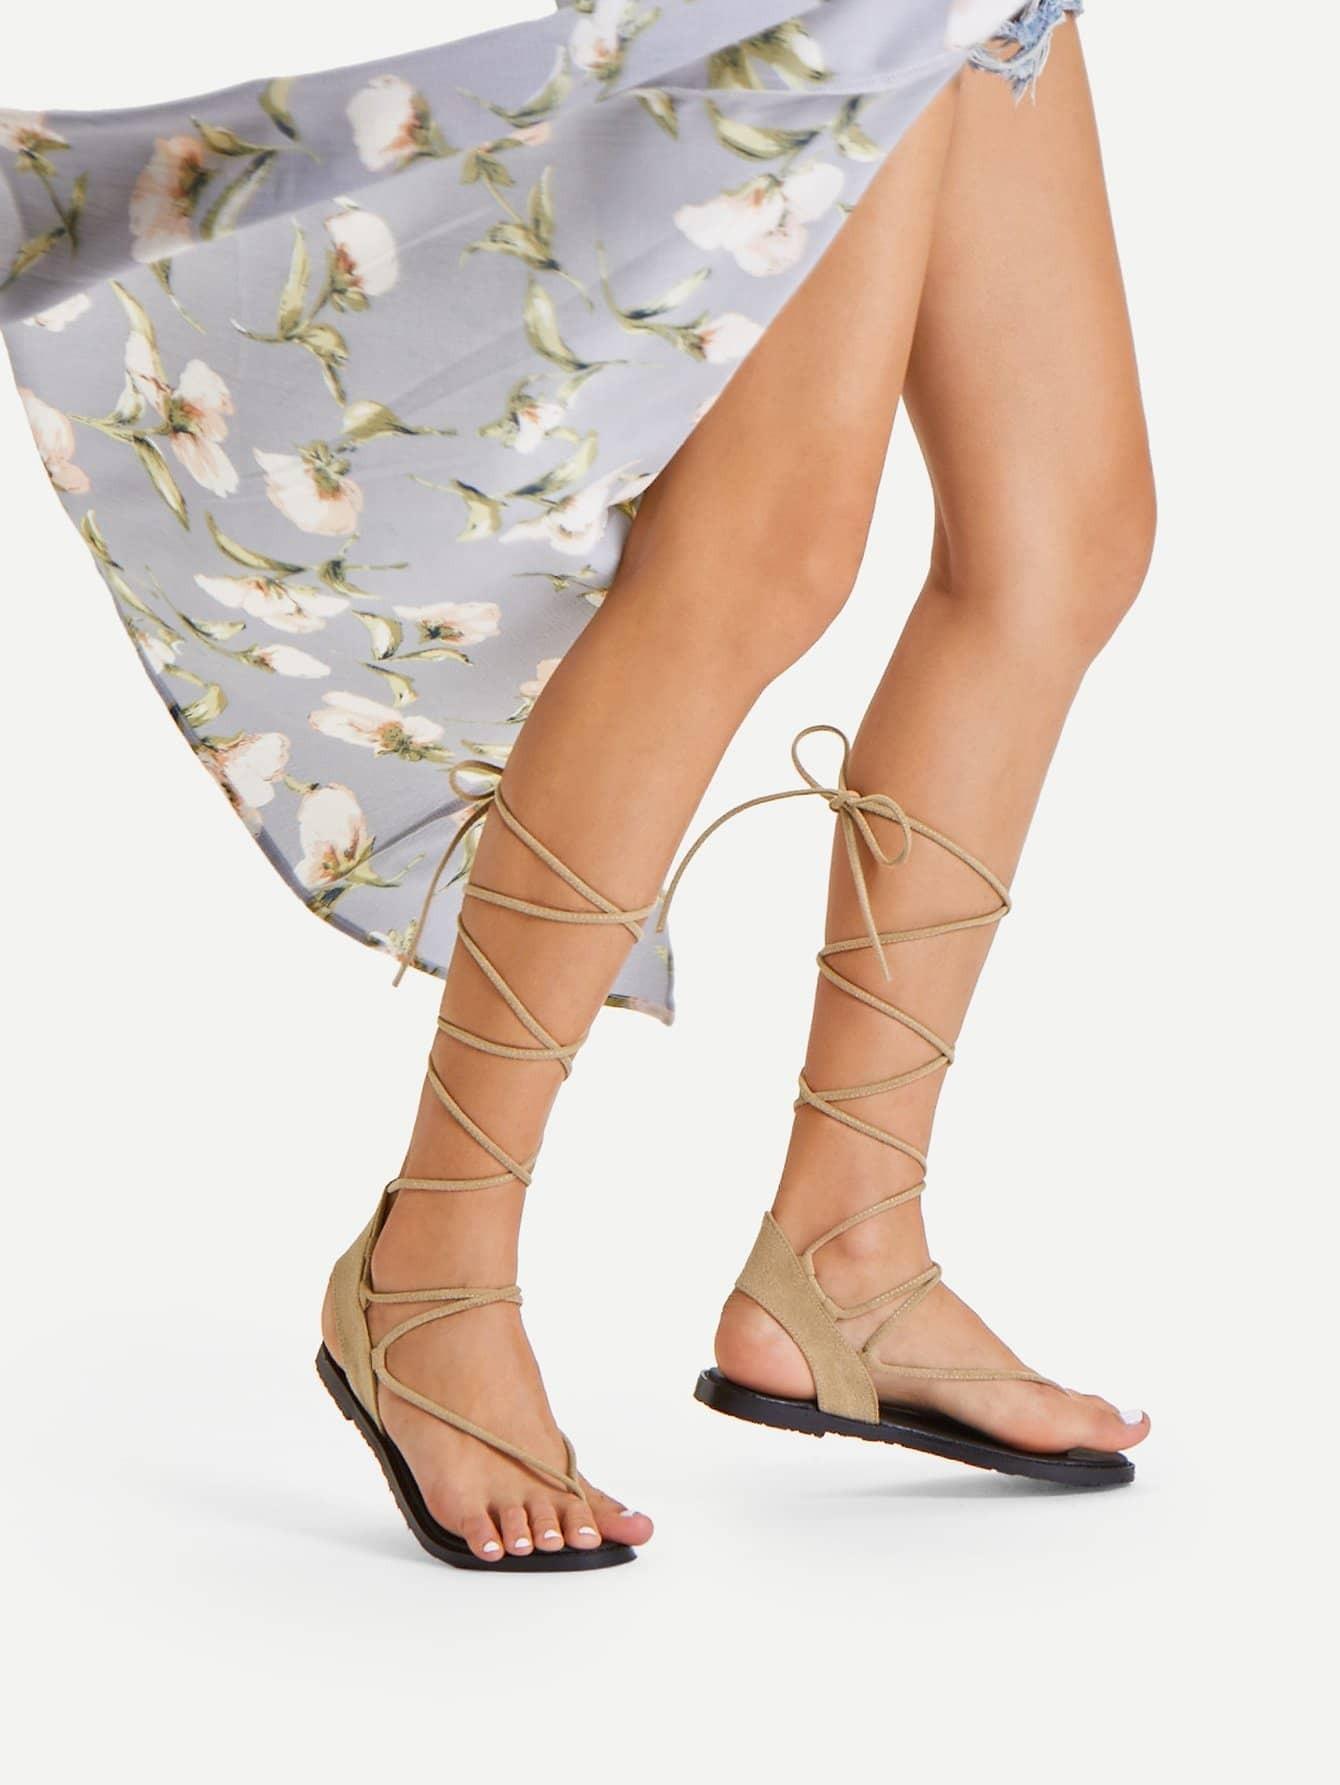 Strappy Gladiator Toe Post Sandals rockstud toe post strappy pu sandals